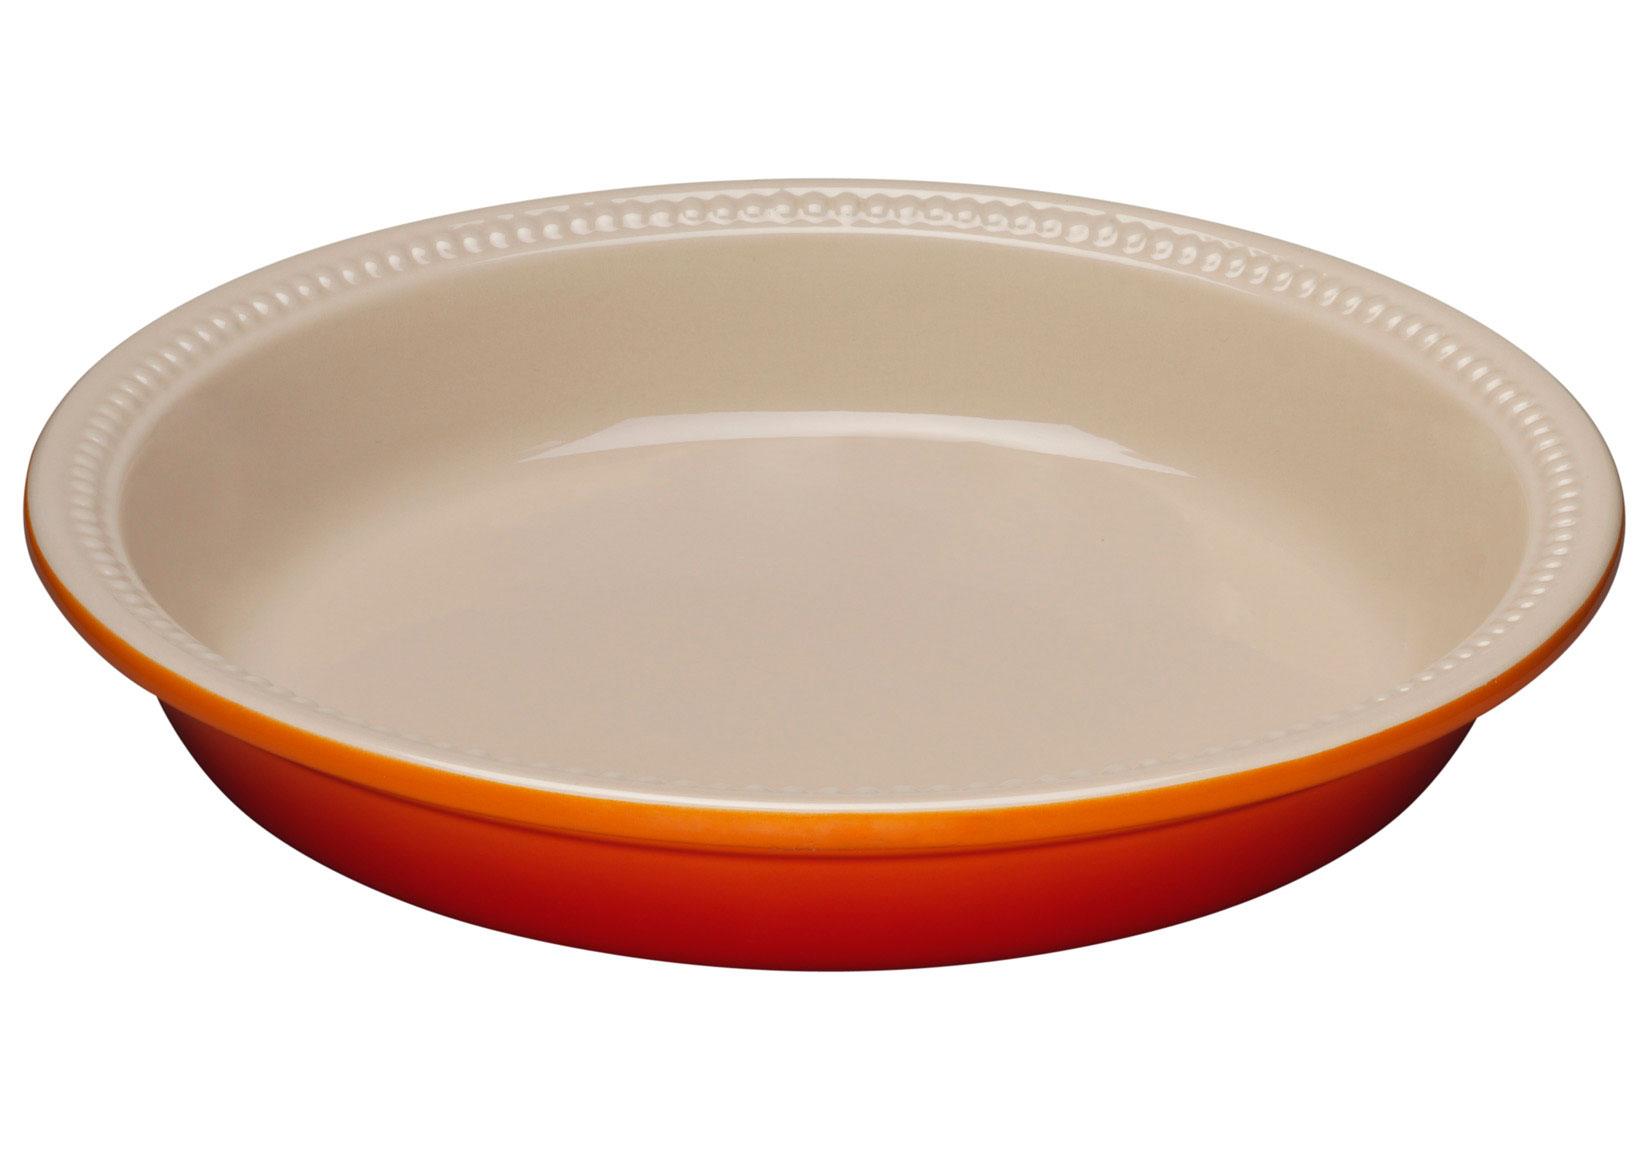 Le Creuset 24cm Stoneware Pie Dish - Volcanic | Jarrold ...